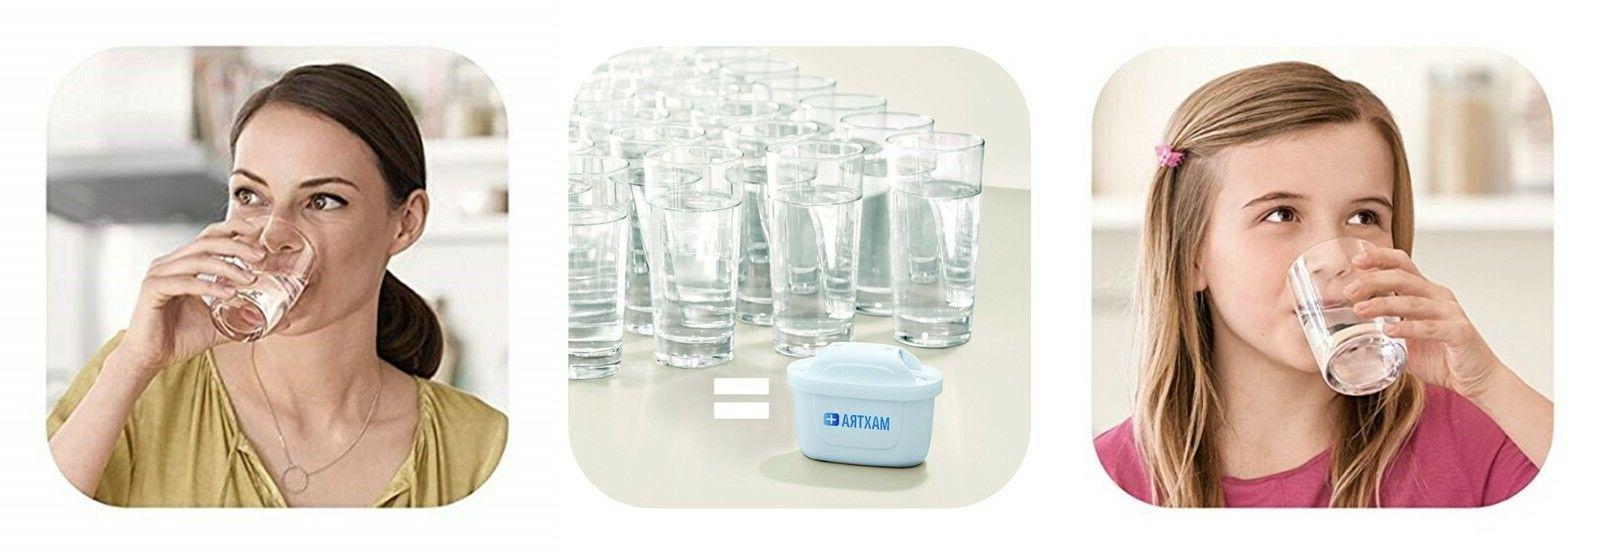 6Pk Filter Water Fresh Healthy Drinking